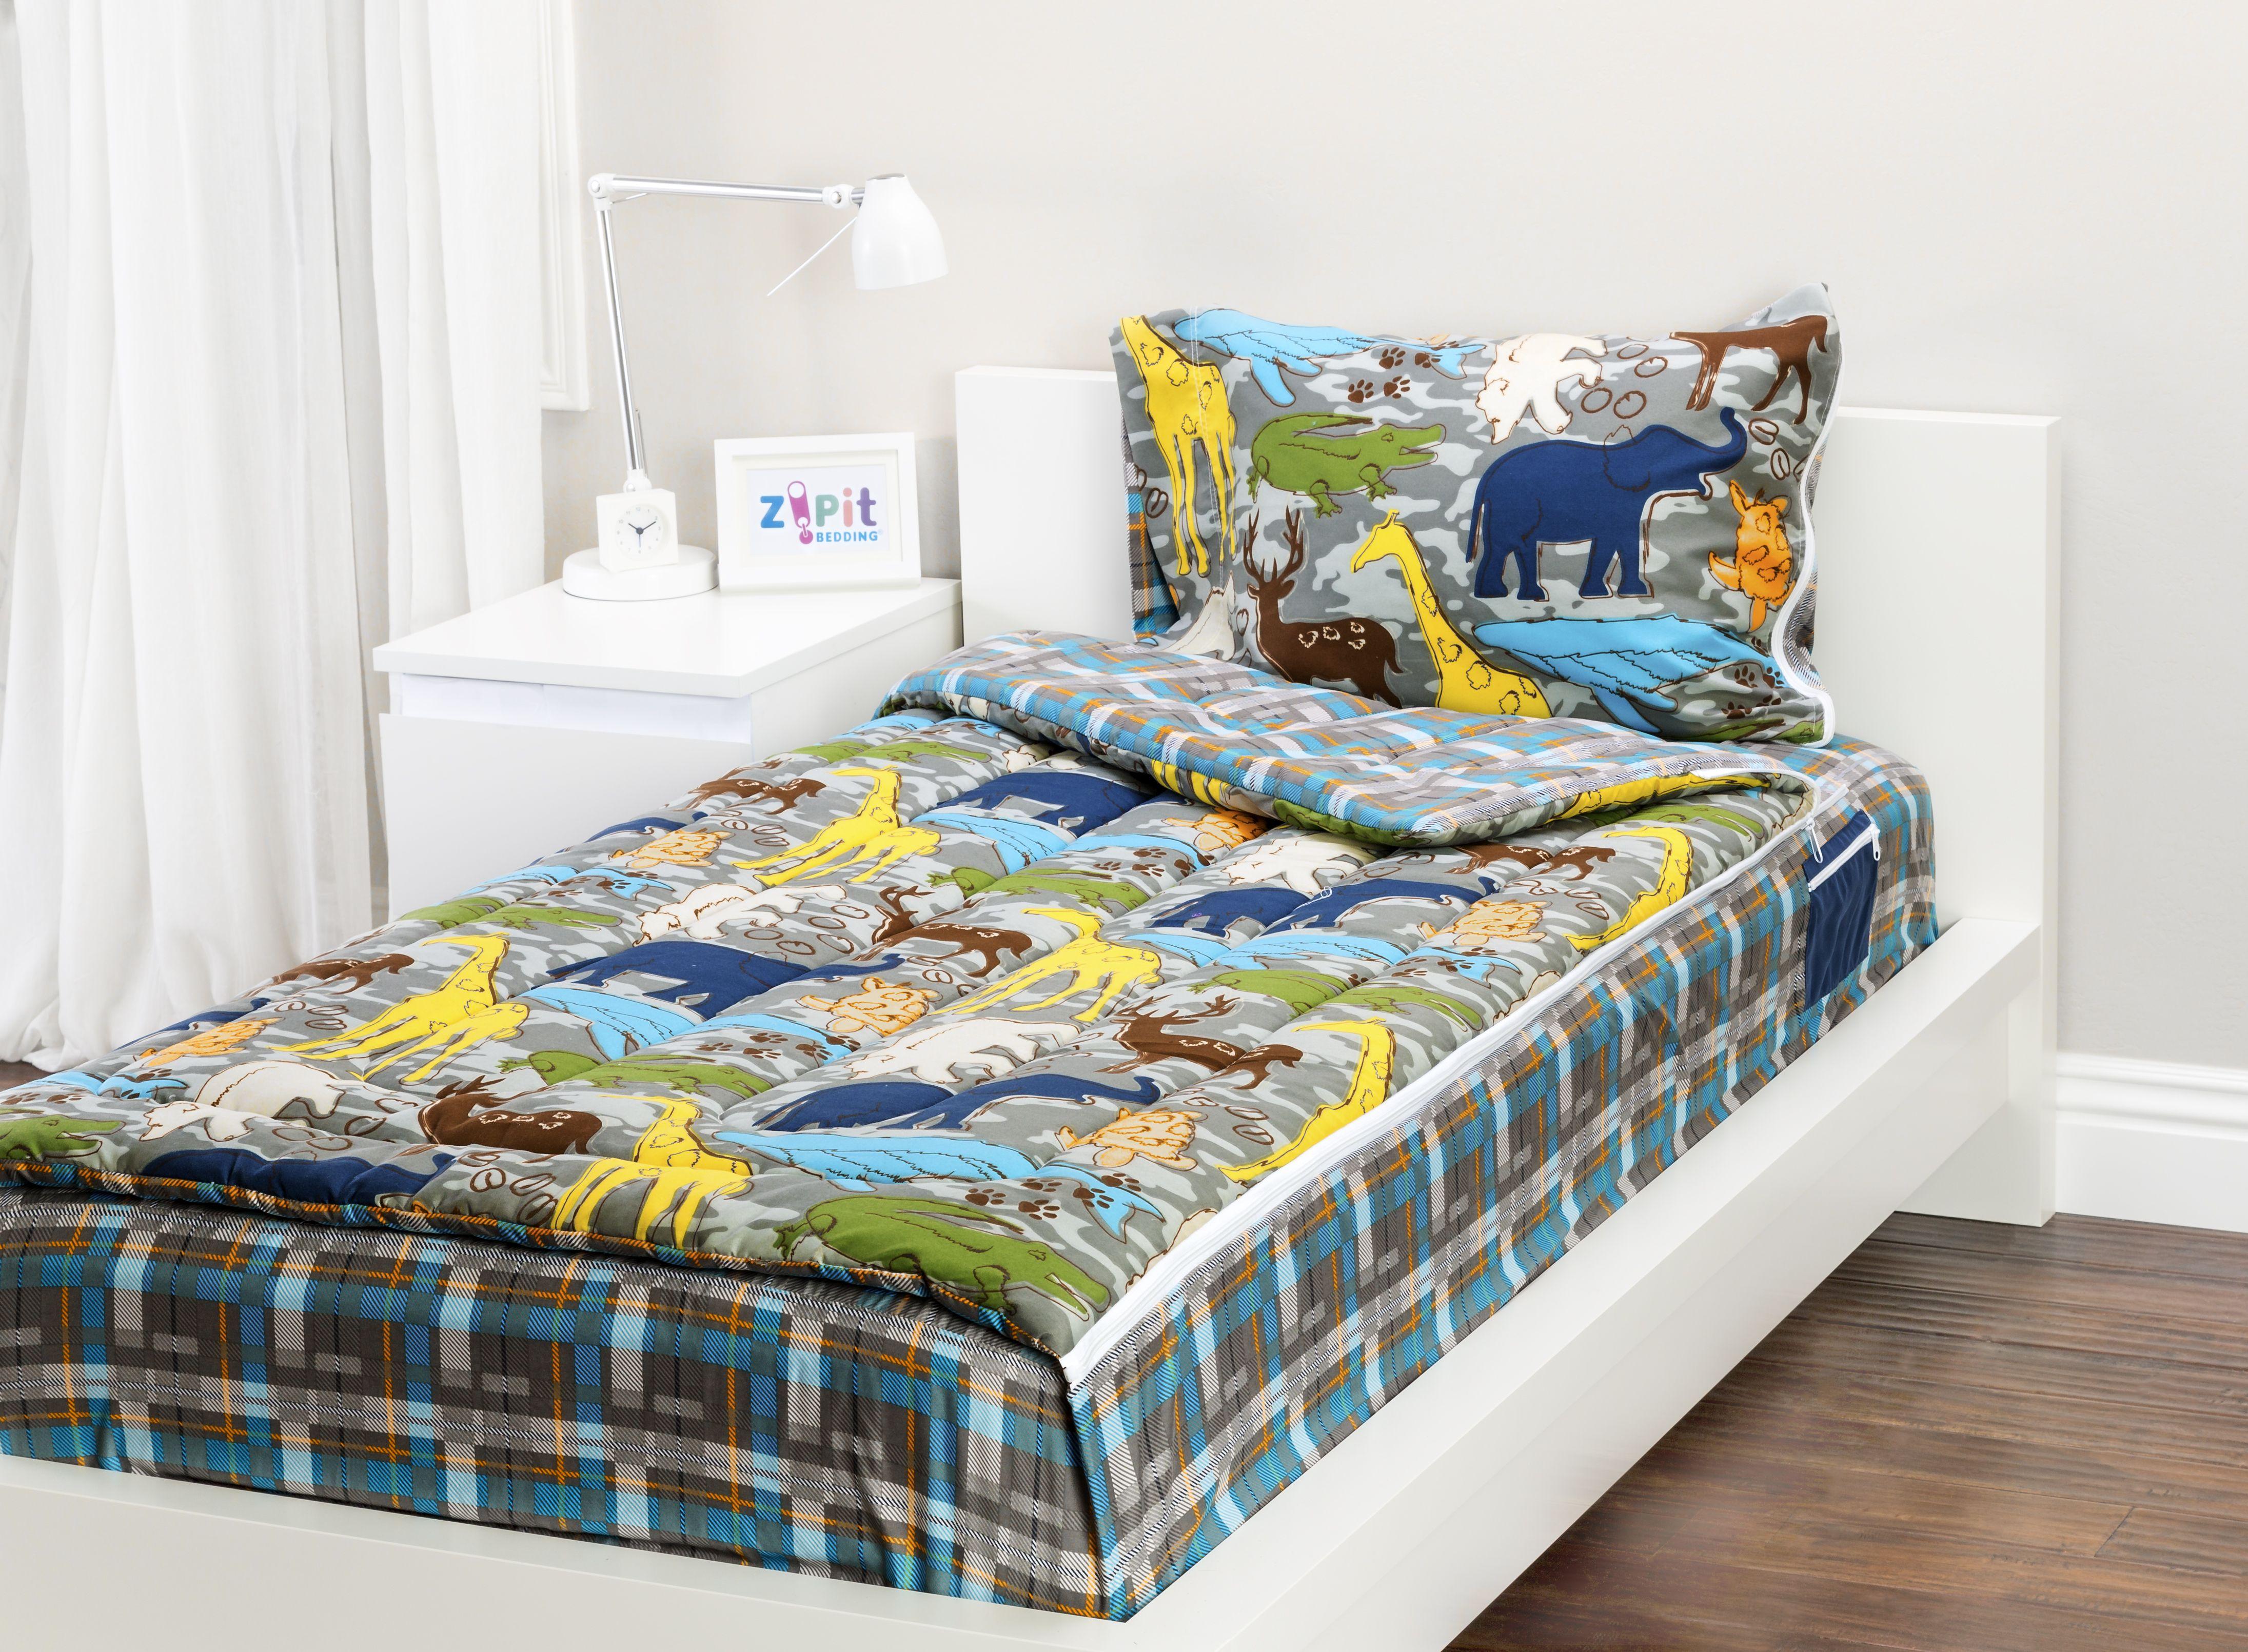 Wild Animals Zipit Bedding Set! Zipit Bedding is America's